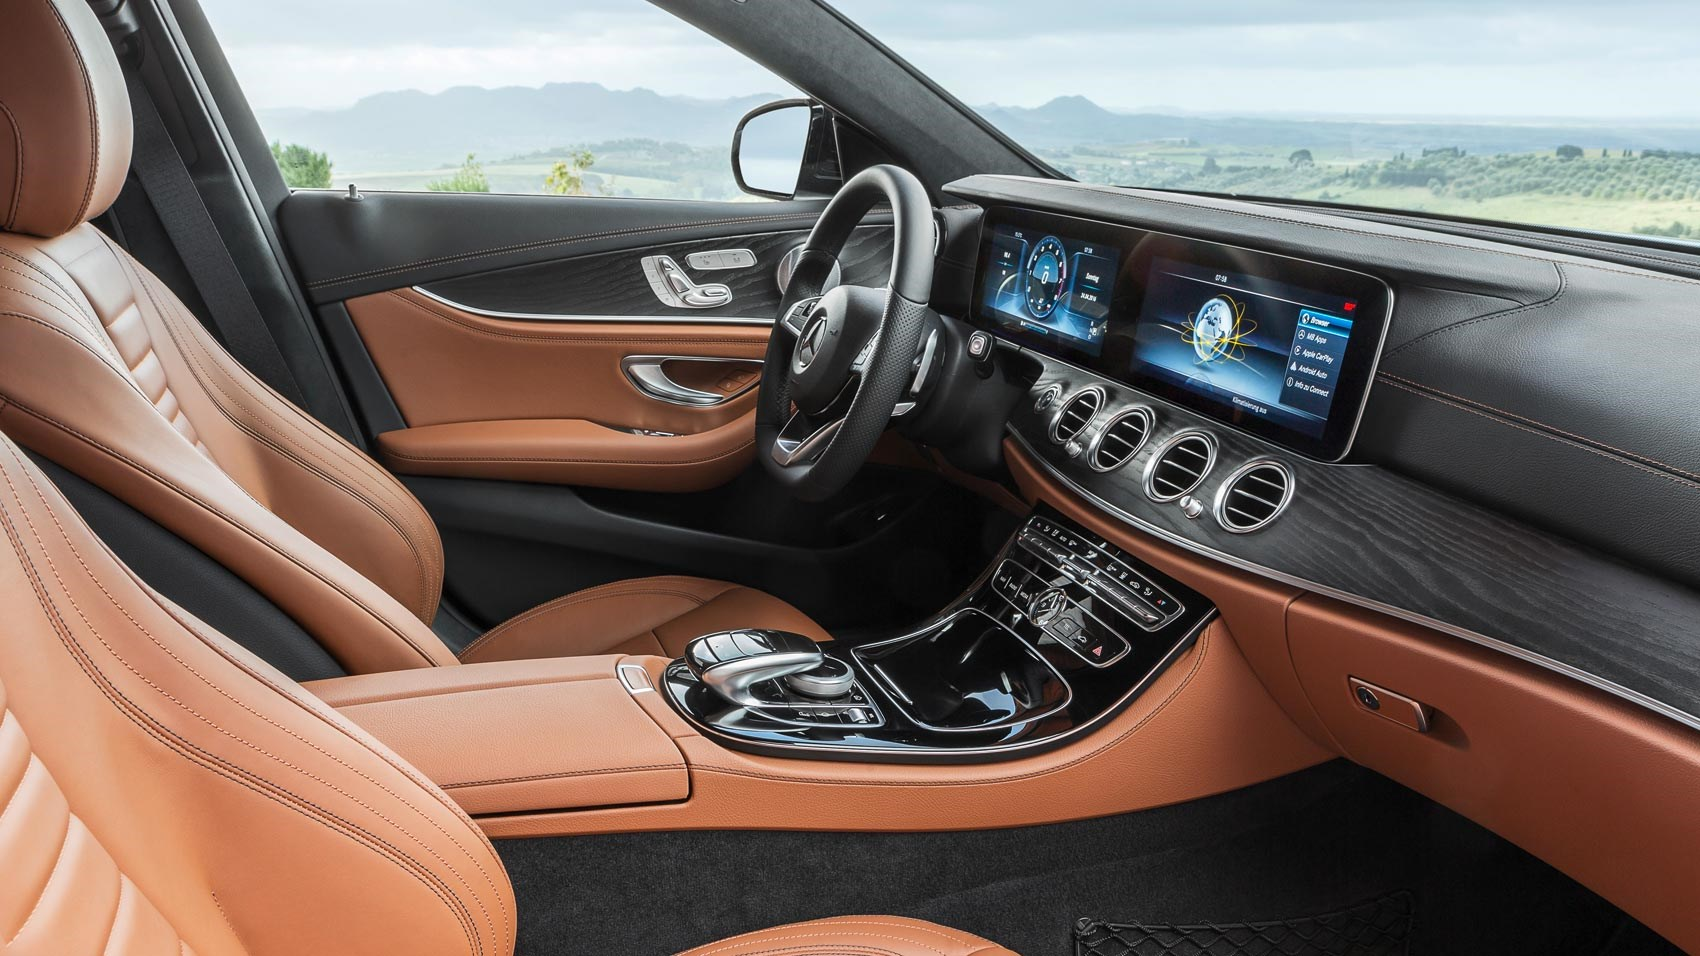 Mercedes Benz Lease >> Mercedes-Benz E220d AMG Line Estate (2016) review by CAR Magazine